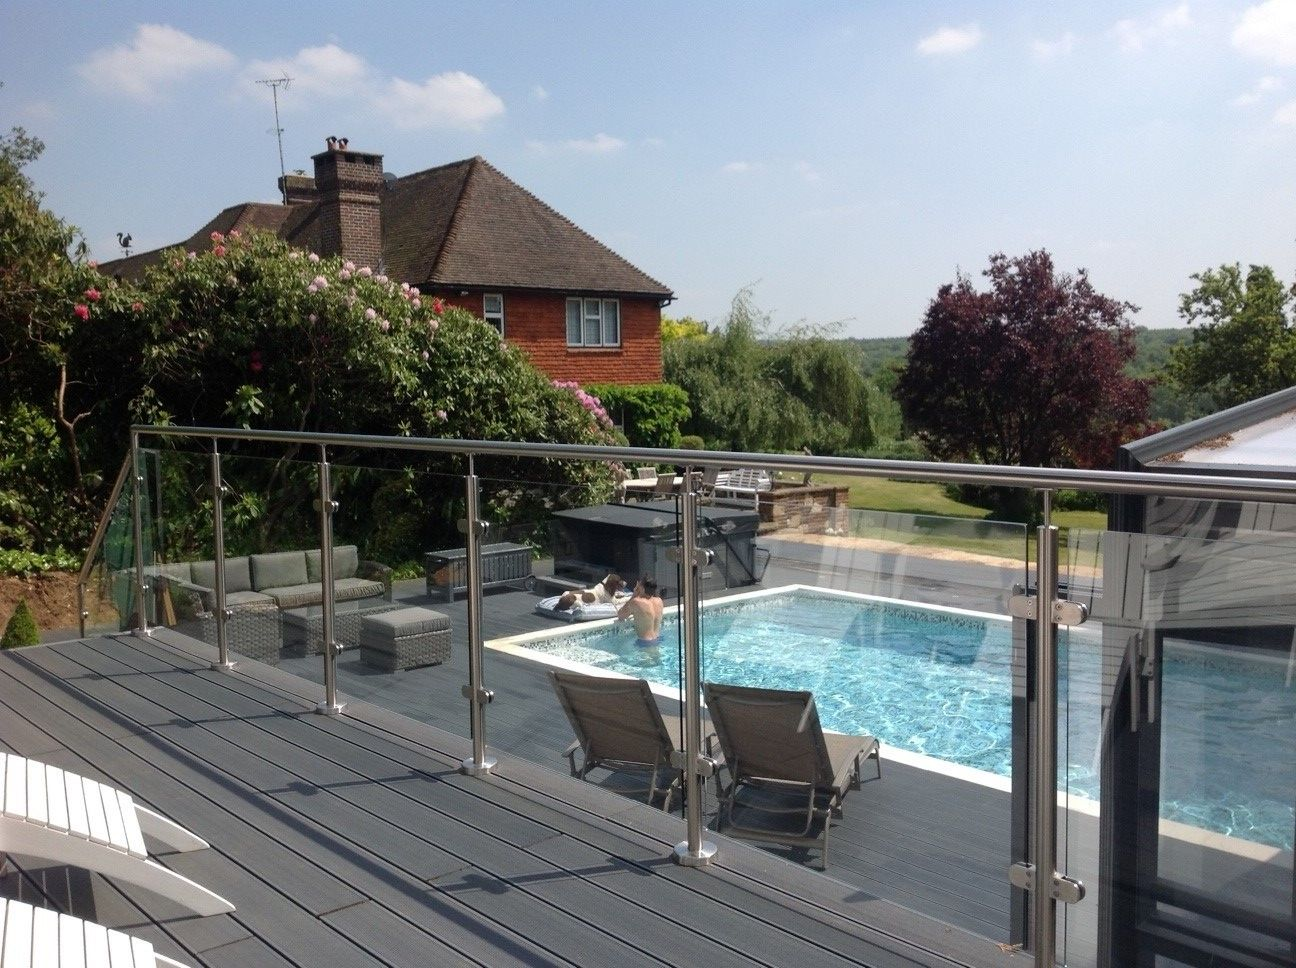 Stainless steel & glass balustrade around swimming pool